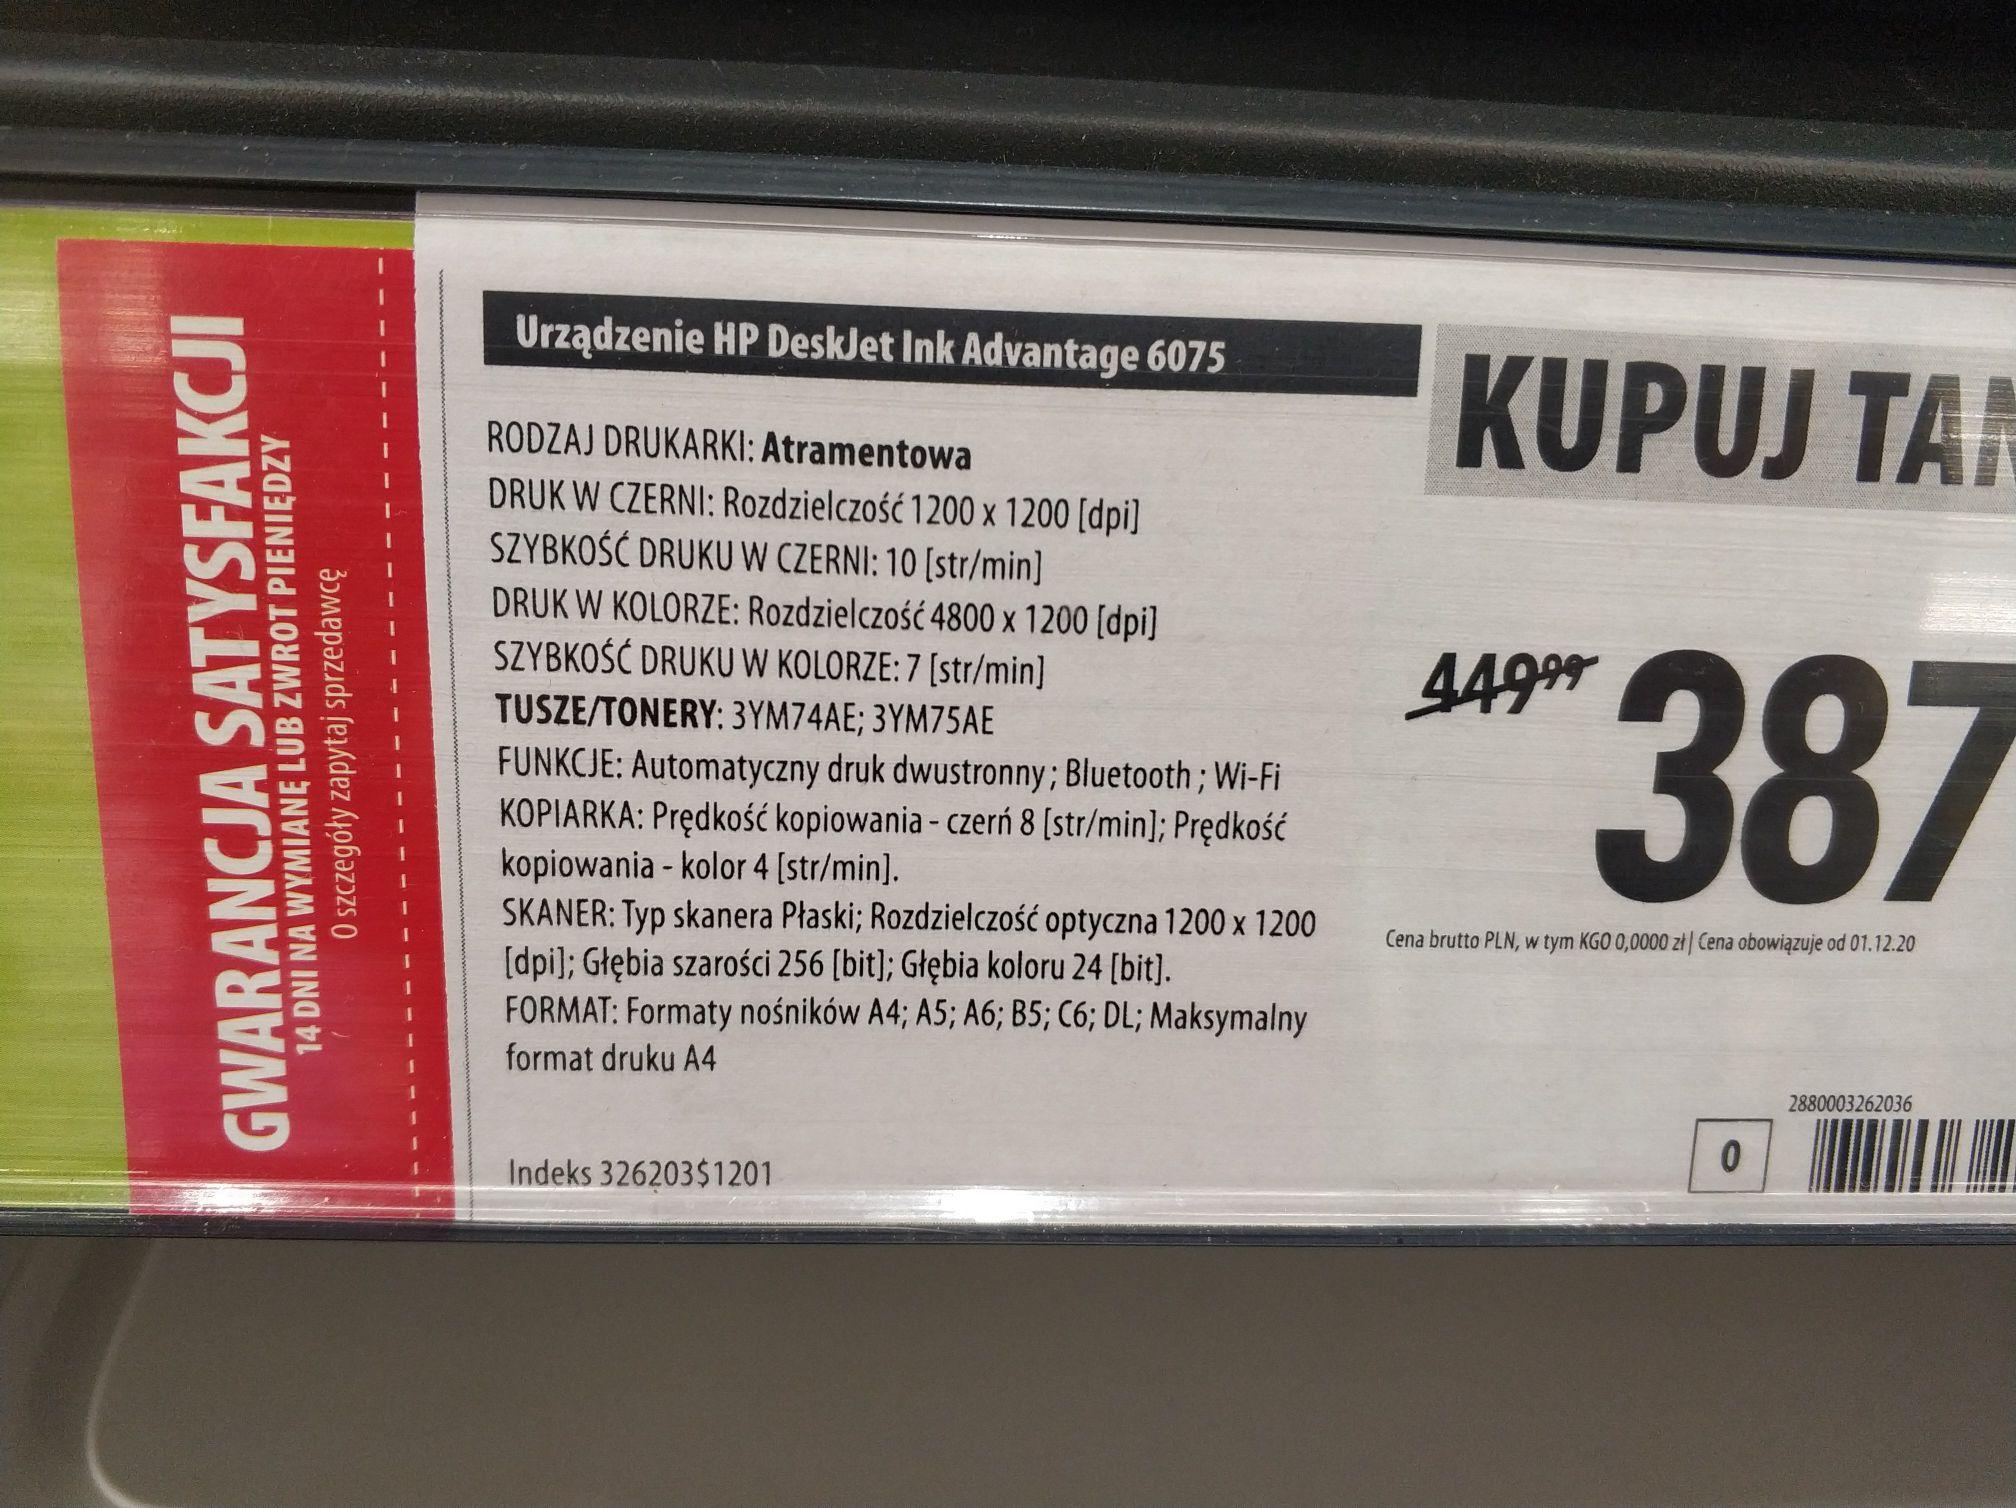 Drukarka HP DeskJet Ink Advantage 6075